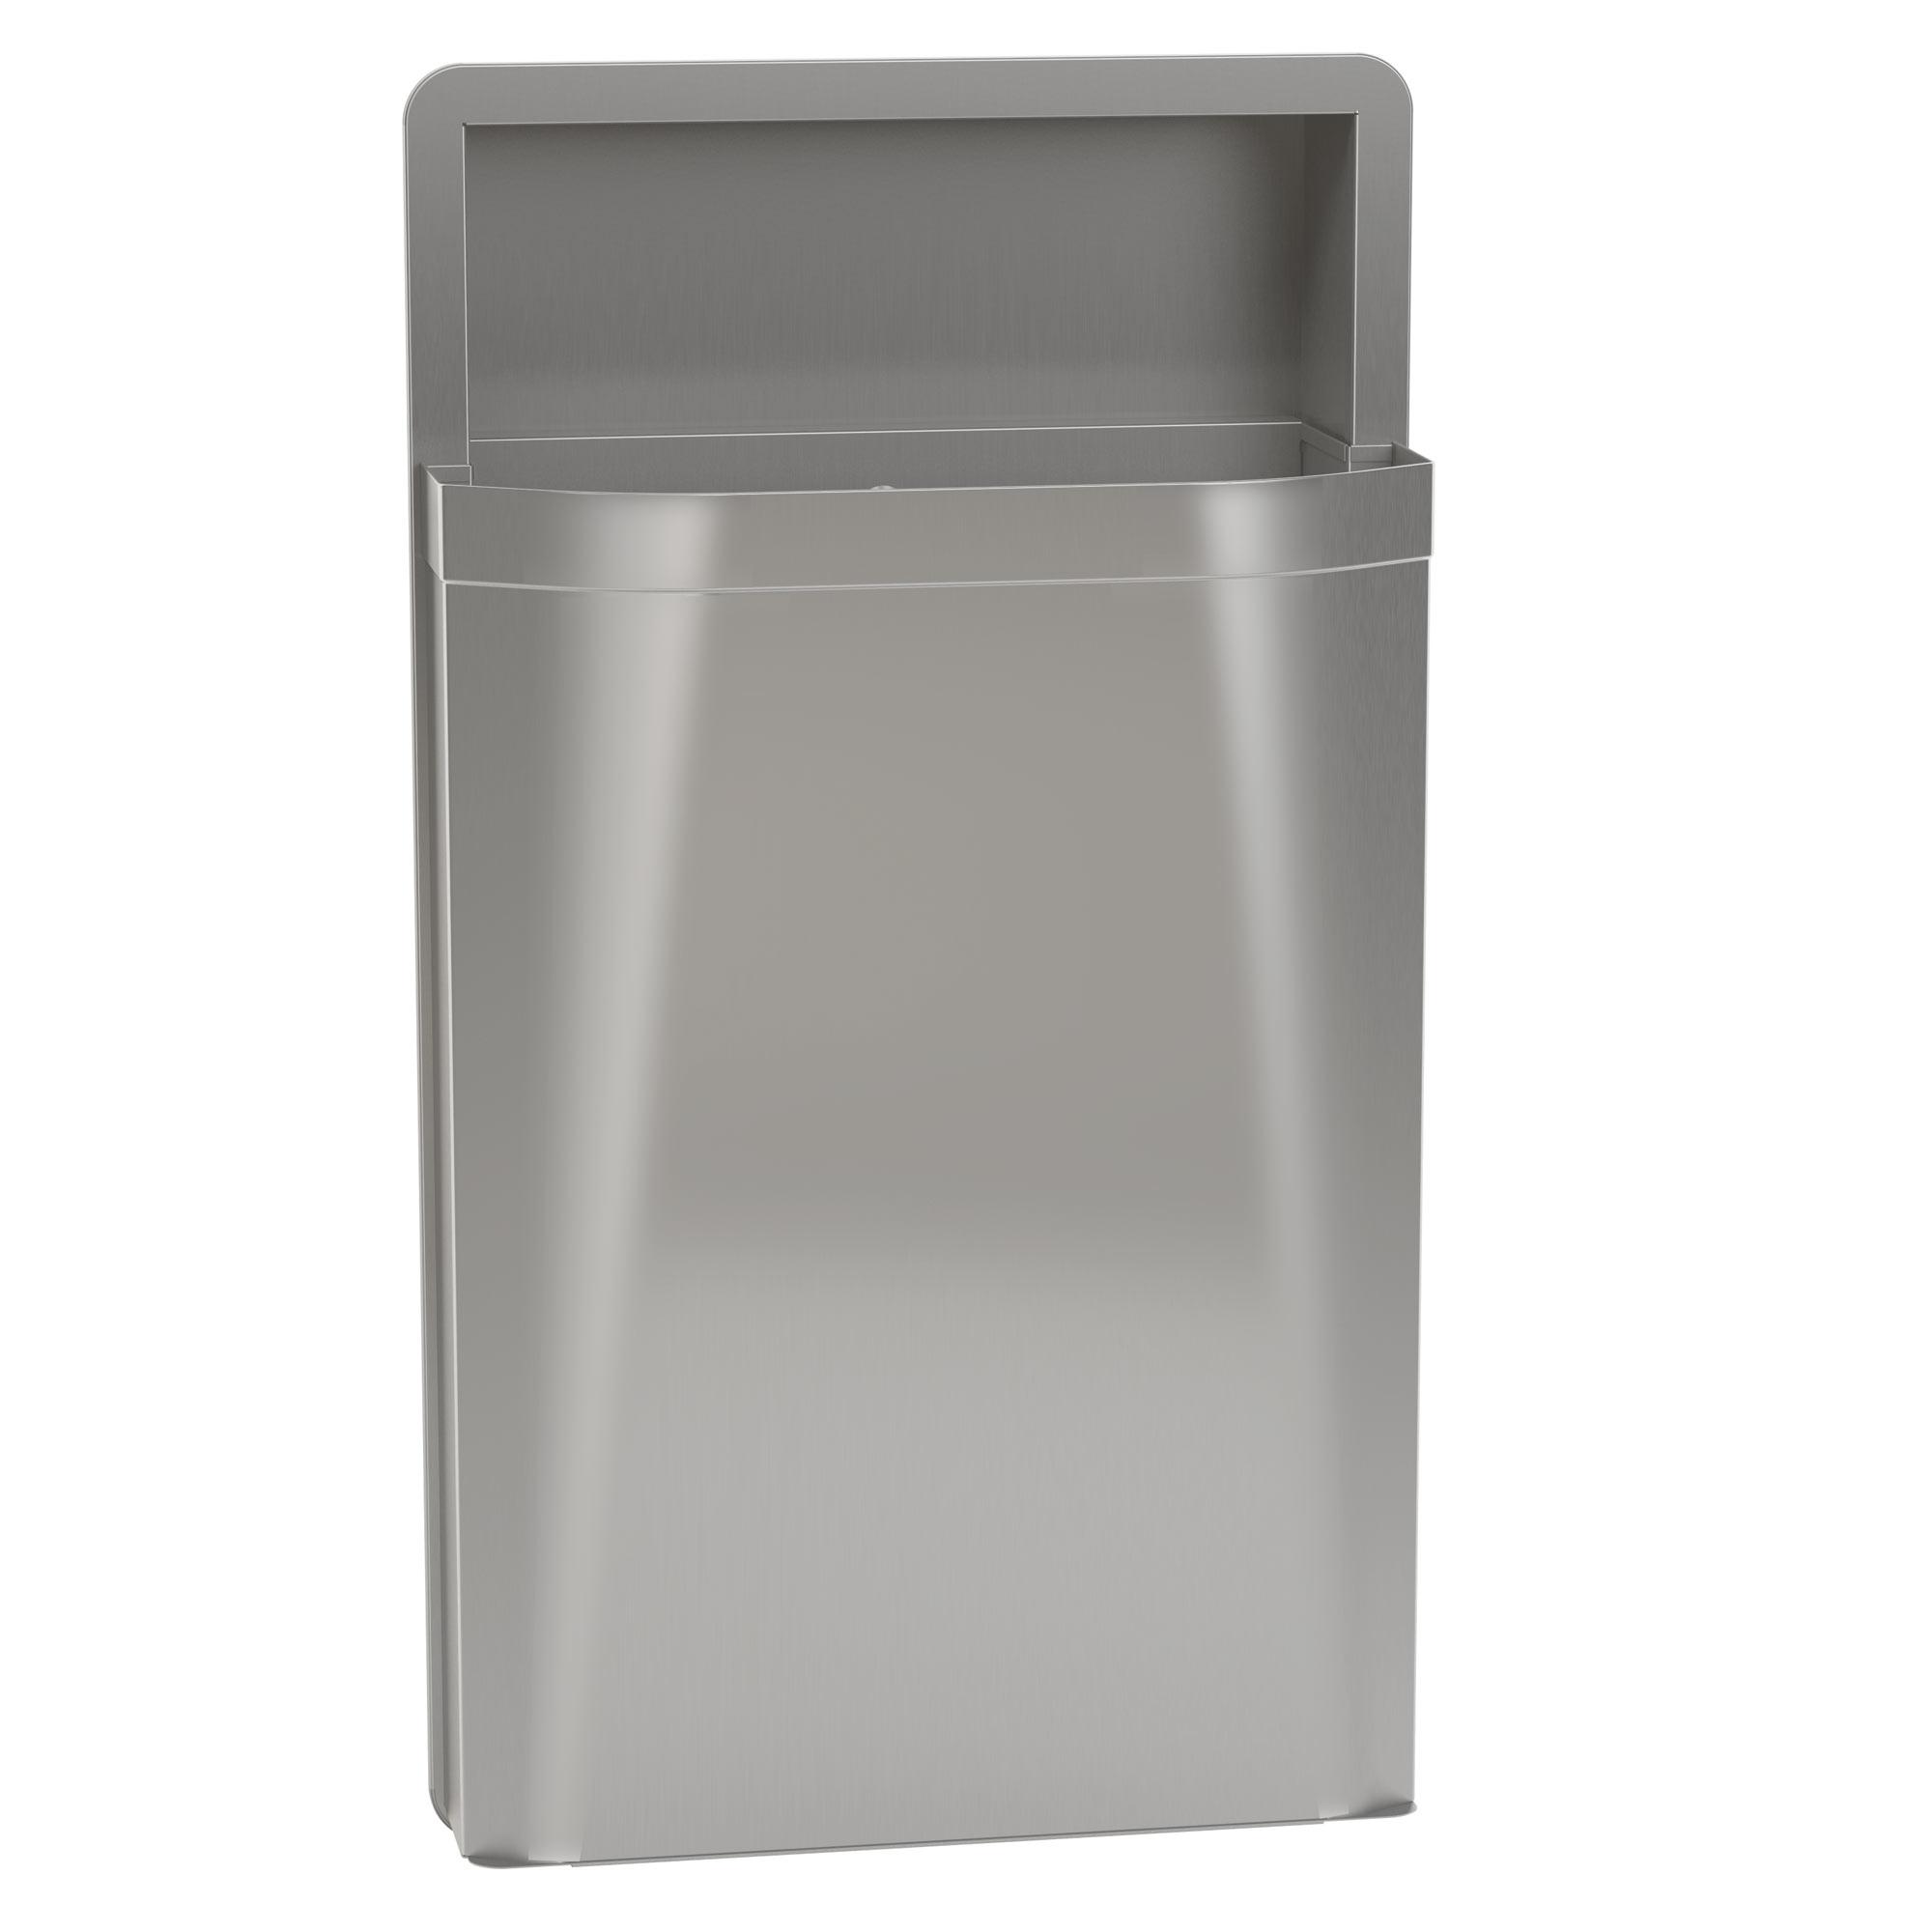 Diplomat waste receptacle bradley corporation - Commercial bathroom waste receptacles ...